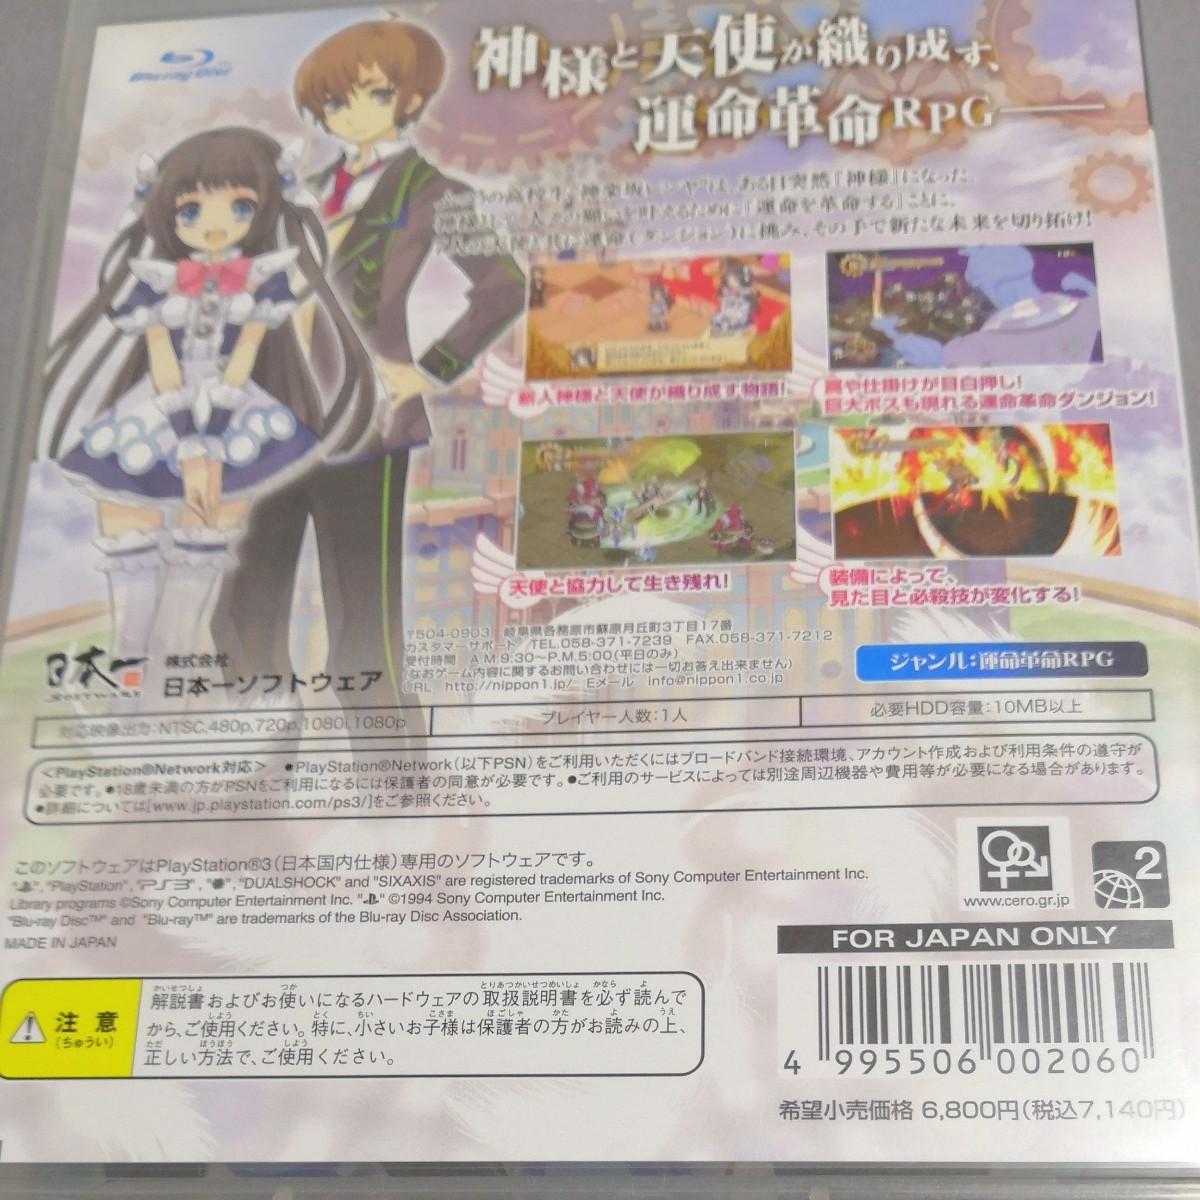 【PS3】 神様と運命革命のパラドクス・ルーンファクトリーオーシャンズ・ソードアートオンラインロストソング